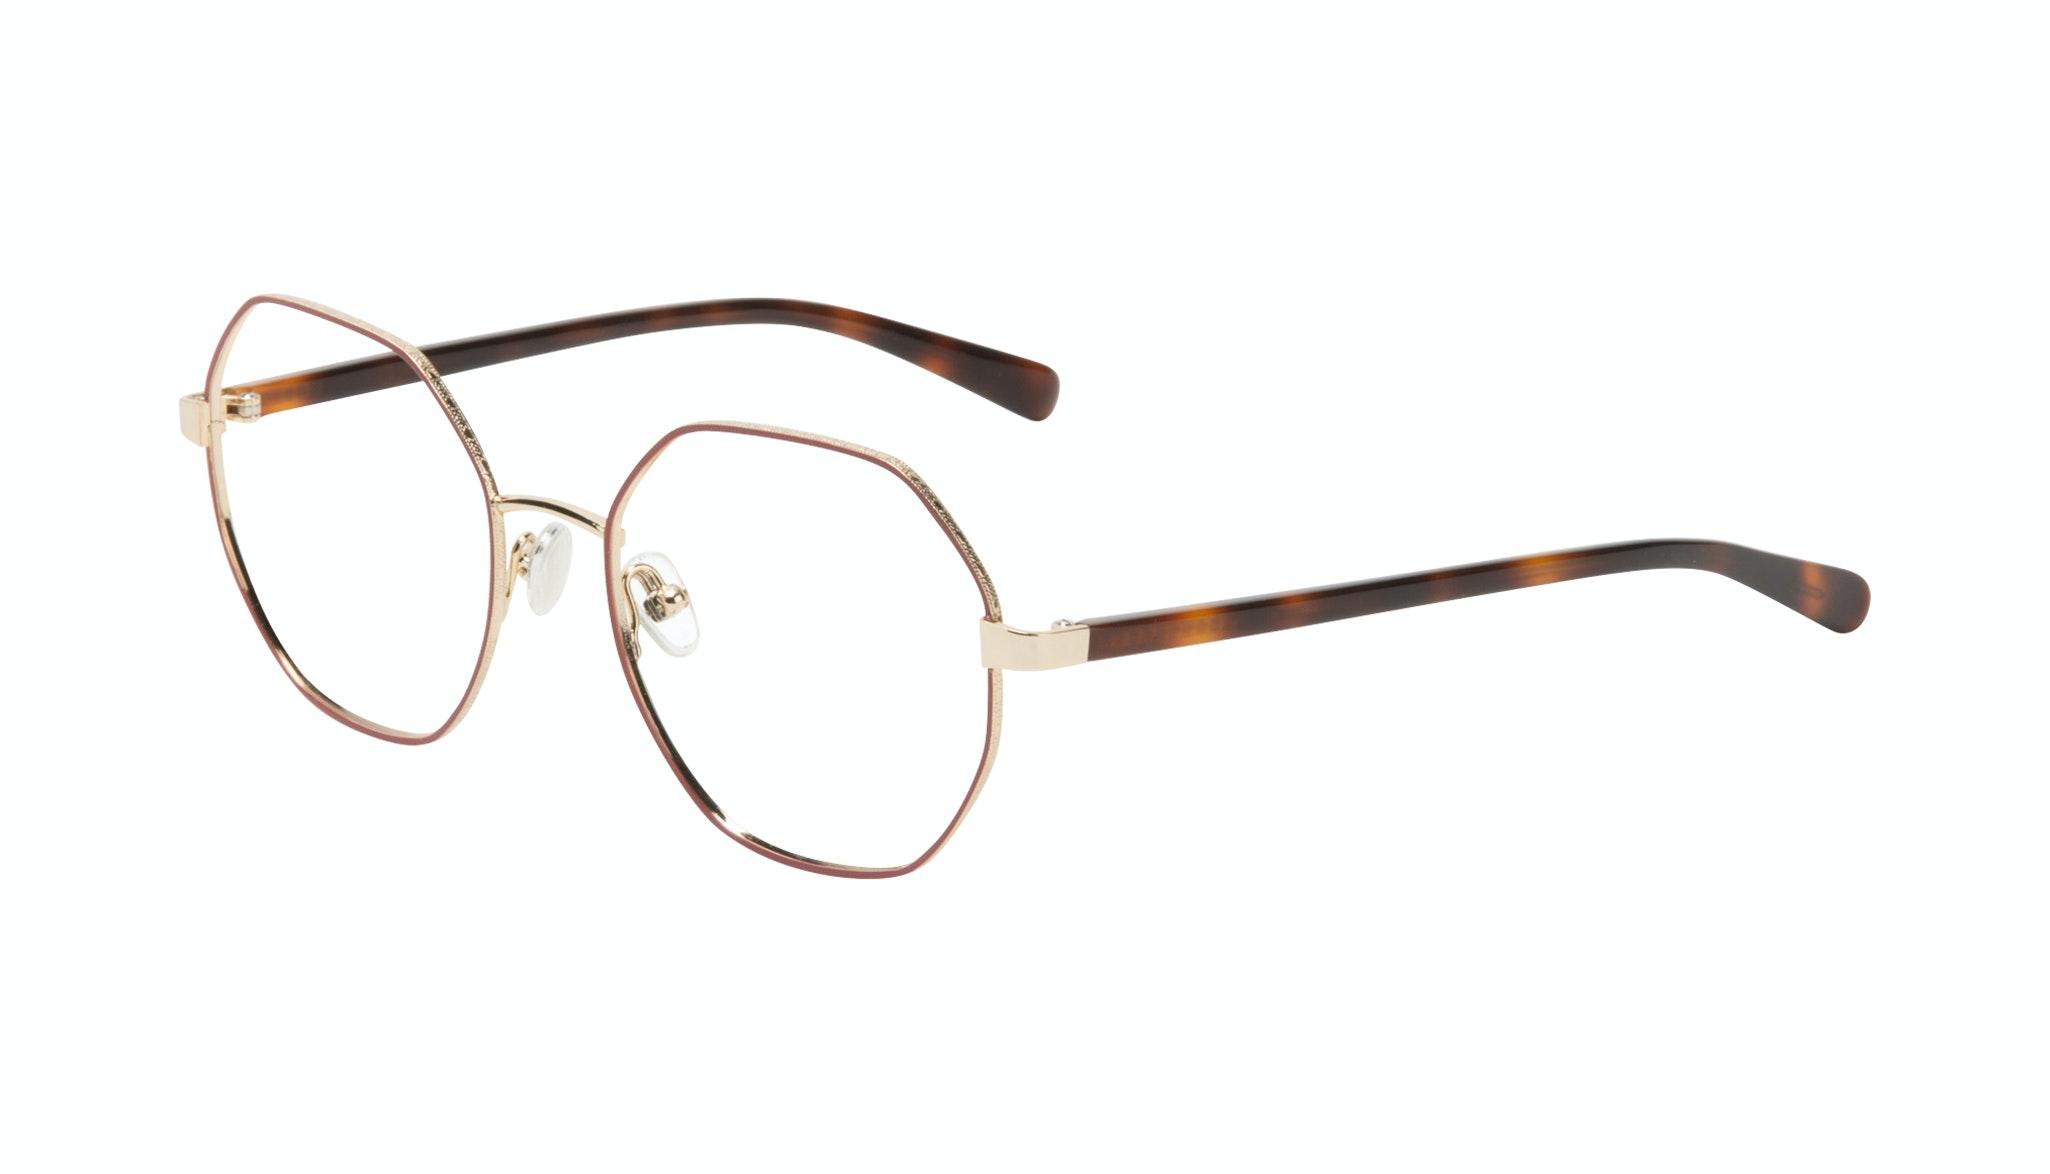 Affordable Fashion Glasses Round Eyeglasses Women Fantasy Wine Tilt